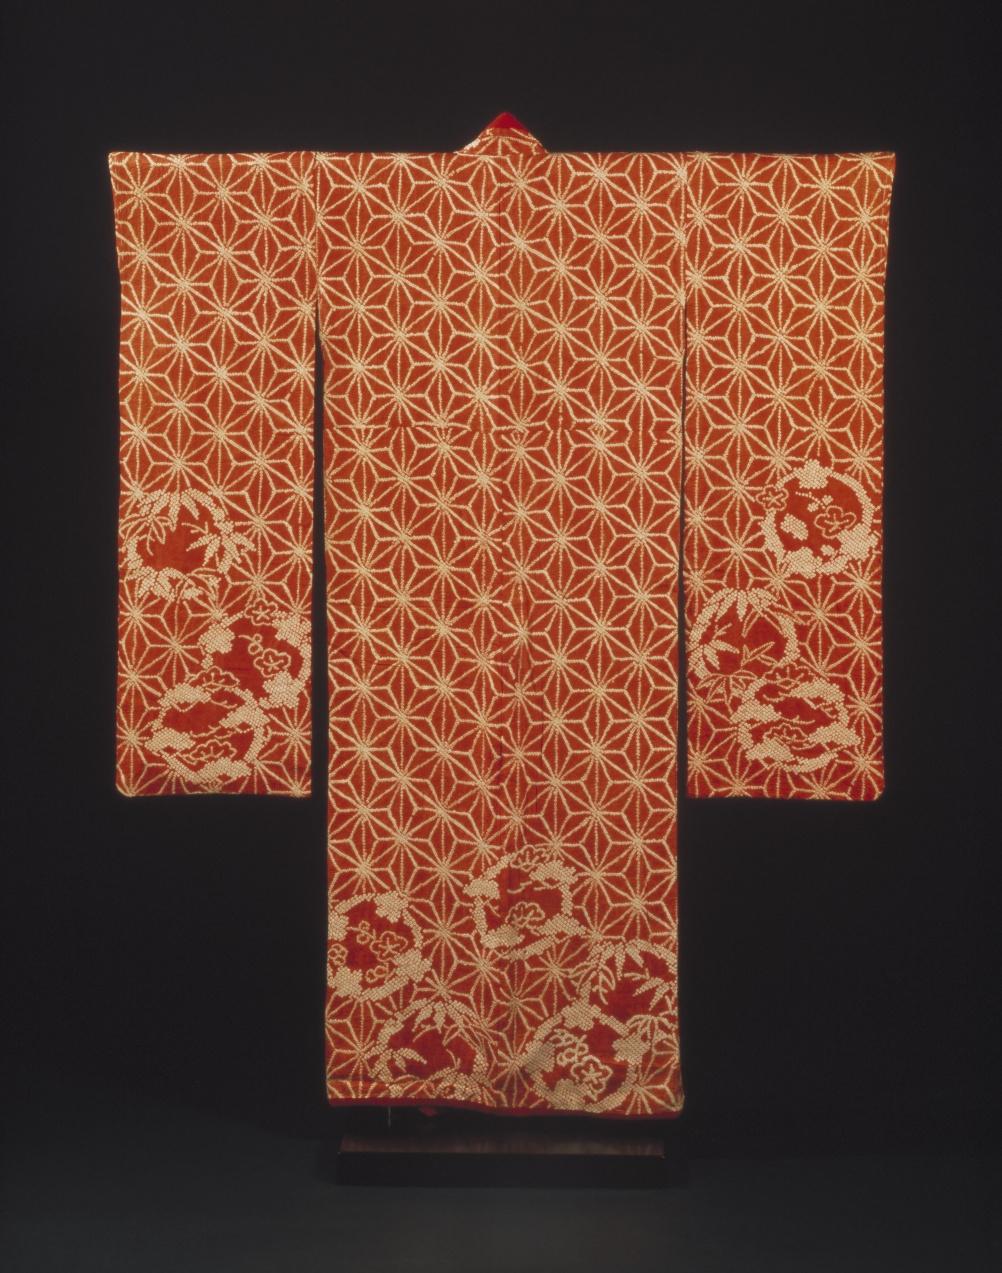 Kimono, 1790-1830 (c) Victoria and Albert Museum, London